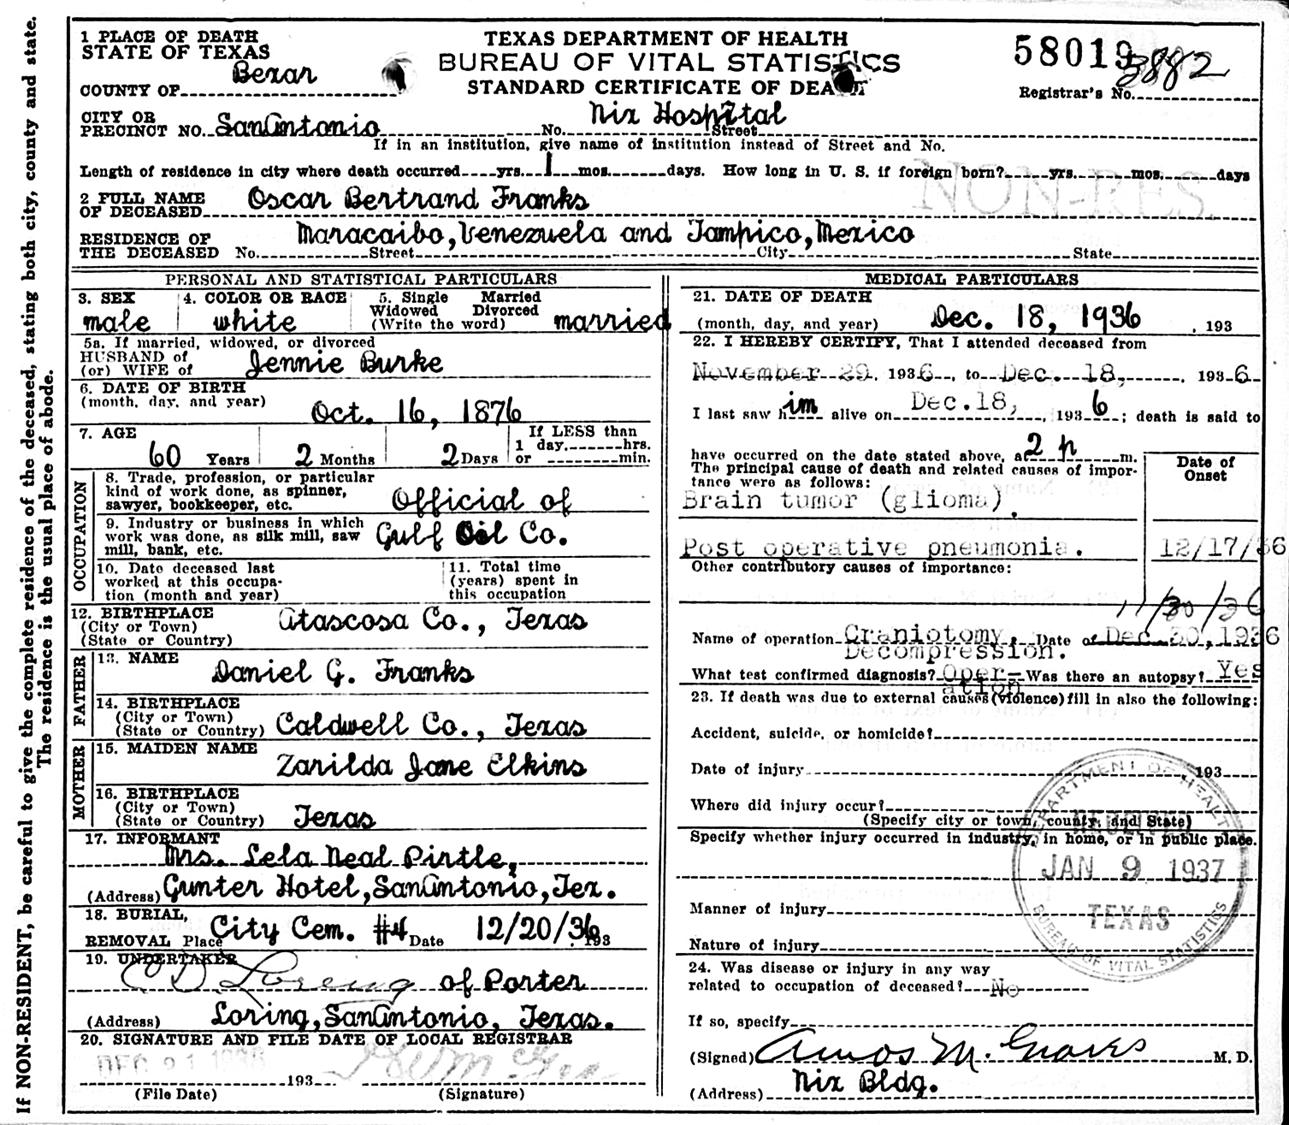 Daniel gandy franks oscar bertrand franks born october 16 1876 in pleasanton atascosa co tx died december 18 1936 at nix hospital san antonio bexar co tx age 60 aiddatafo Choice Image